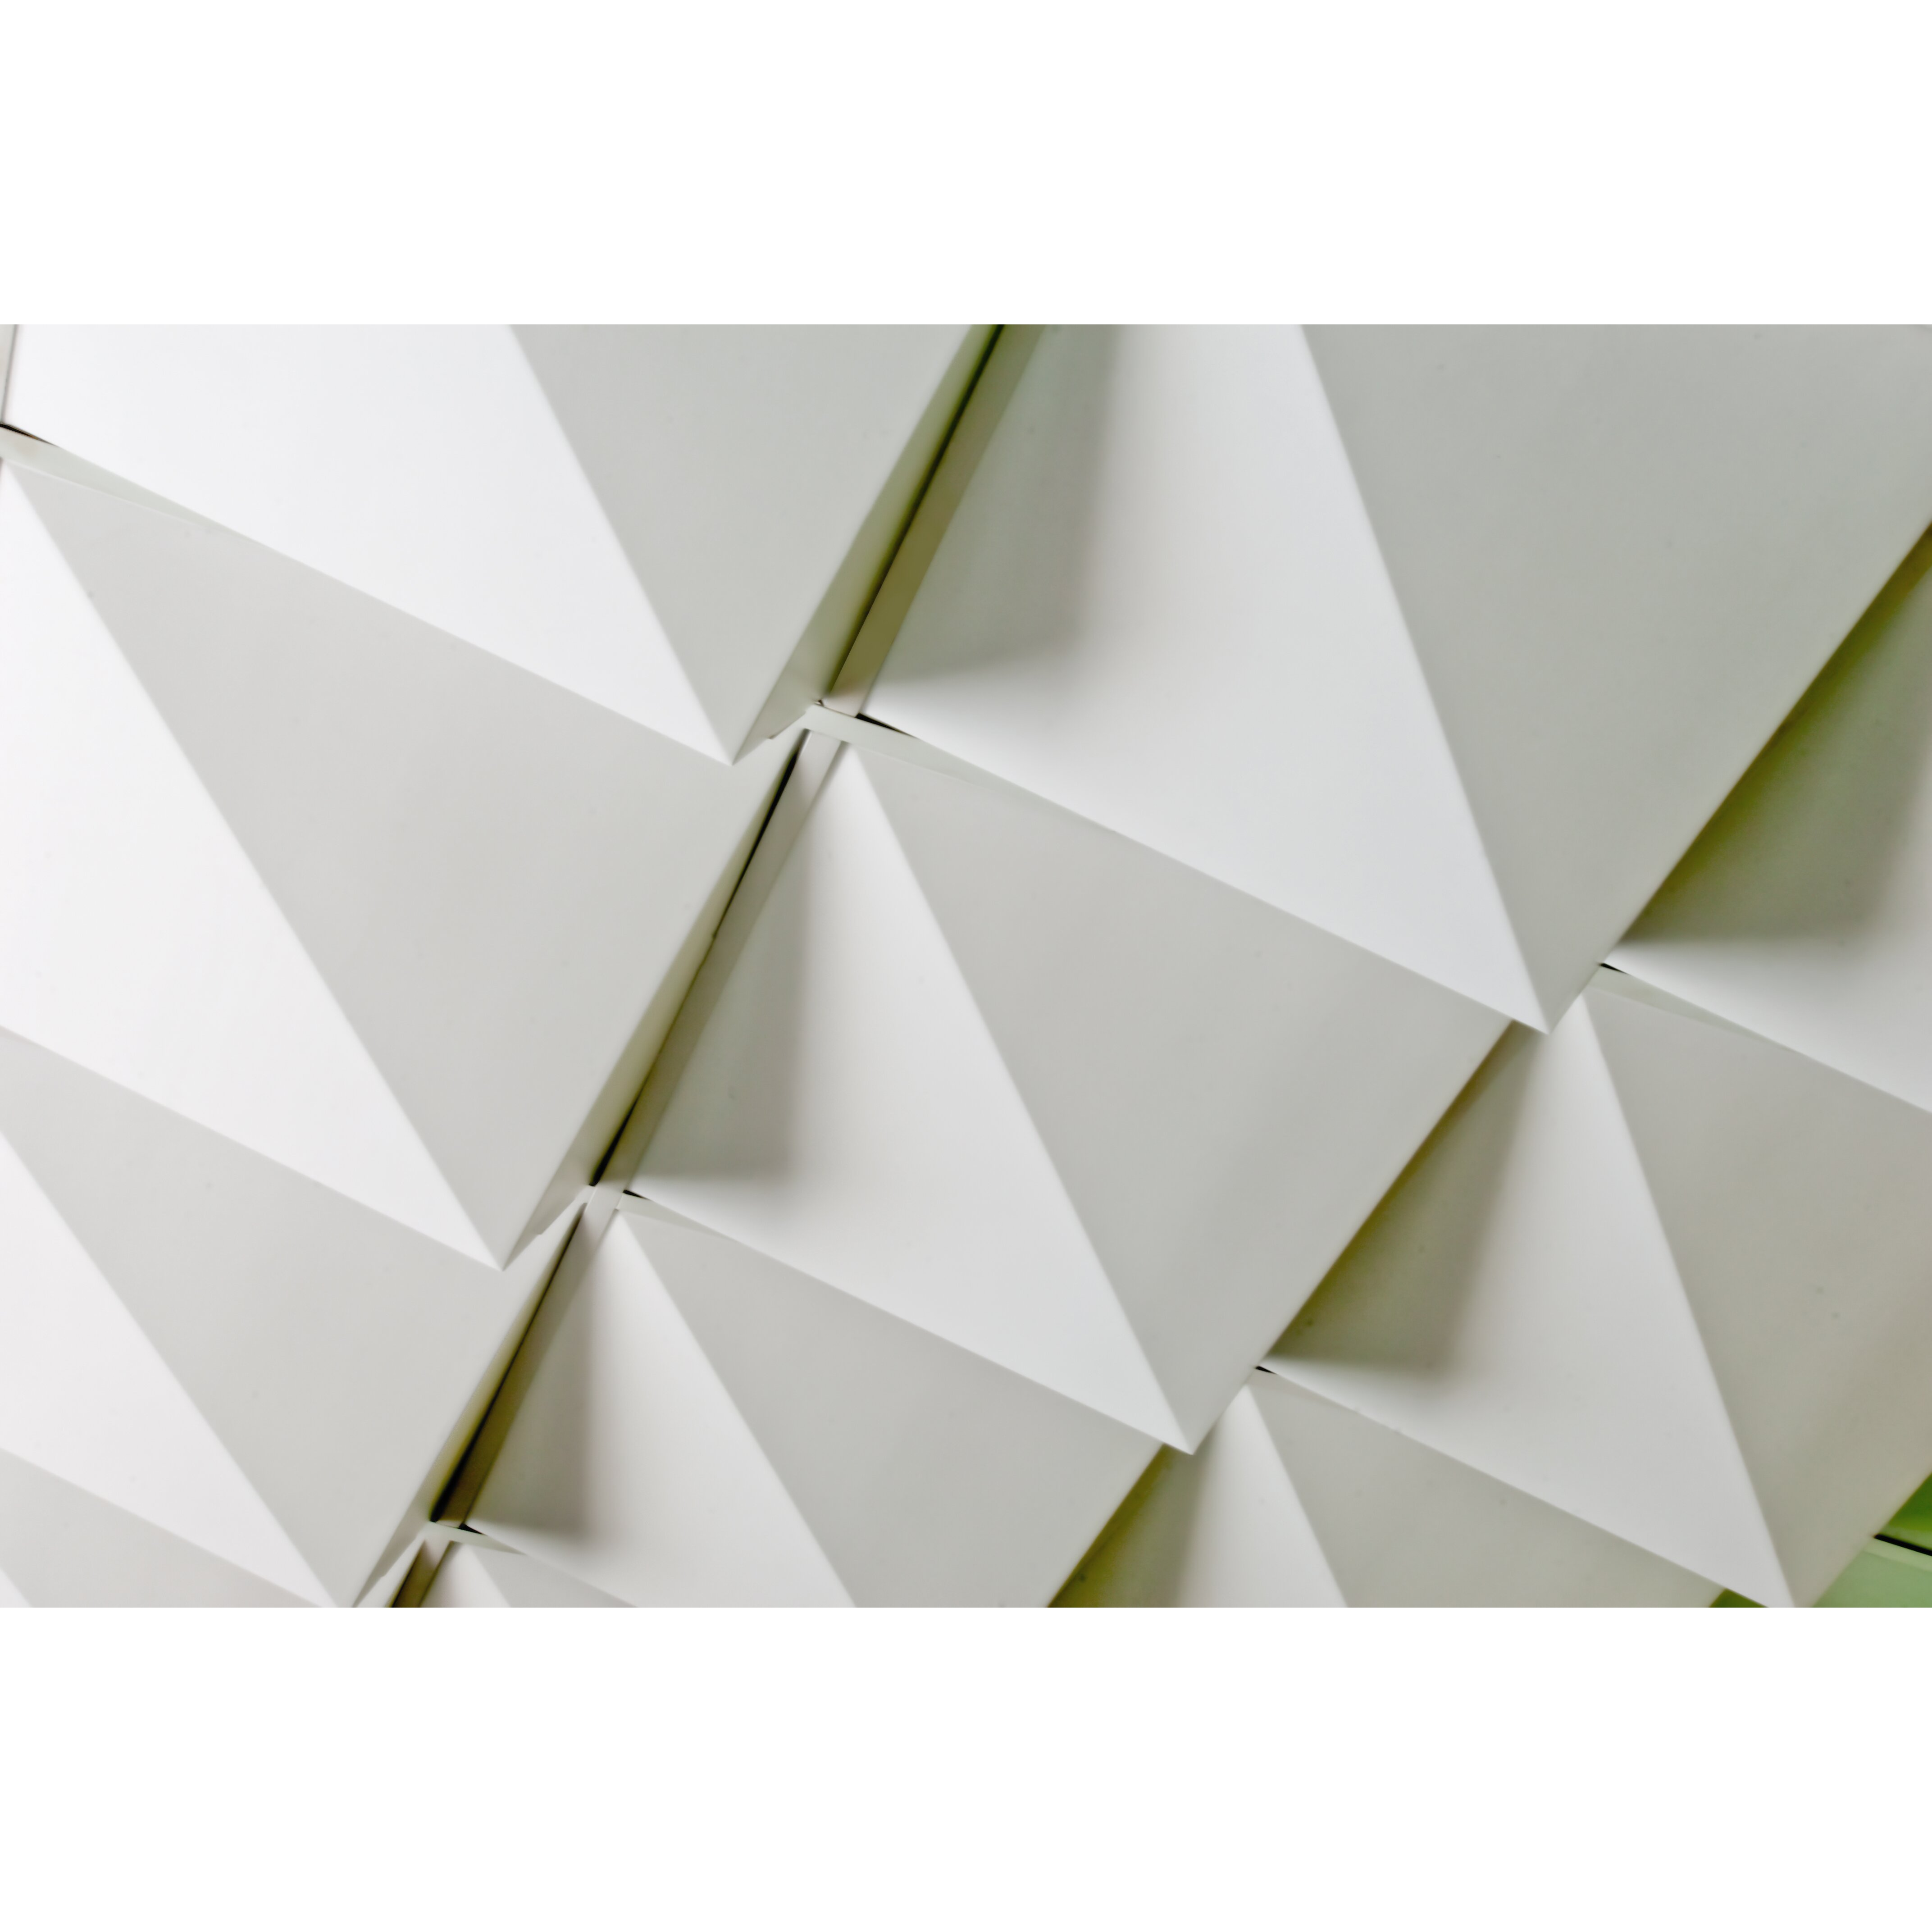 Fall ceiling tiles